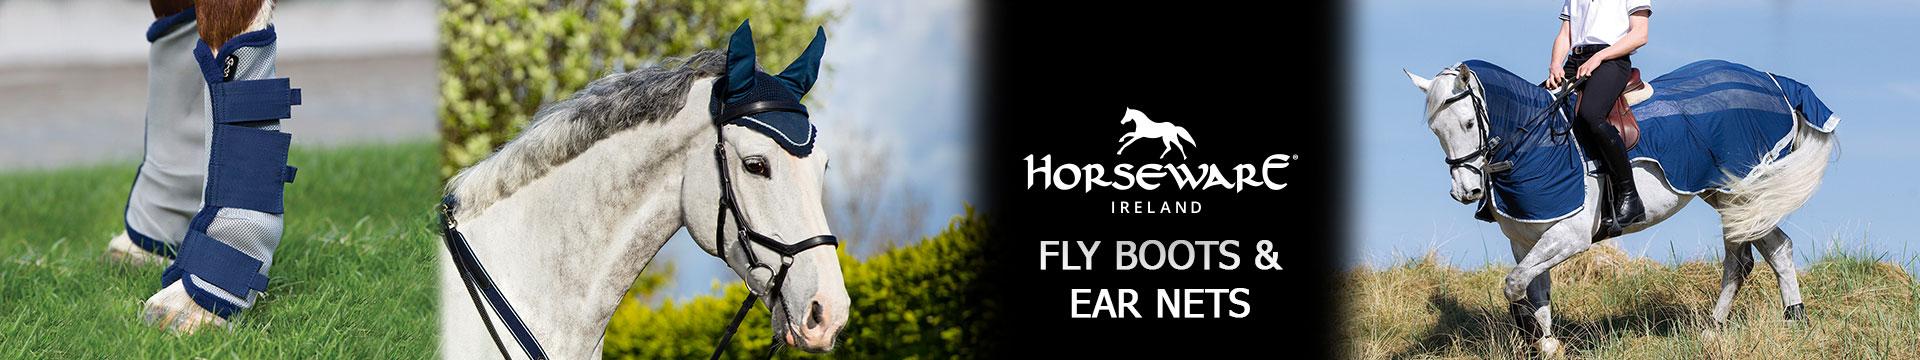 Horseware Fly Boots & Ear Nets